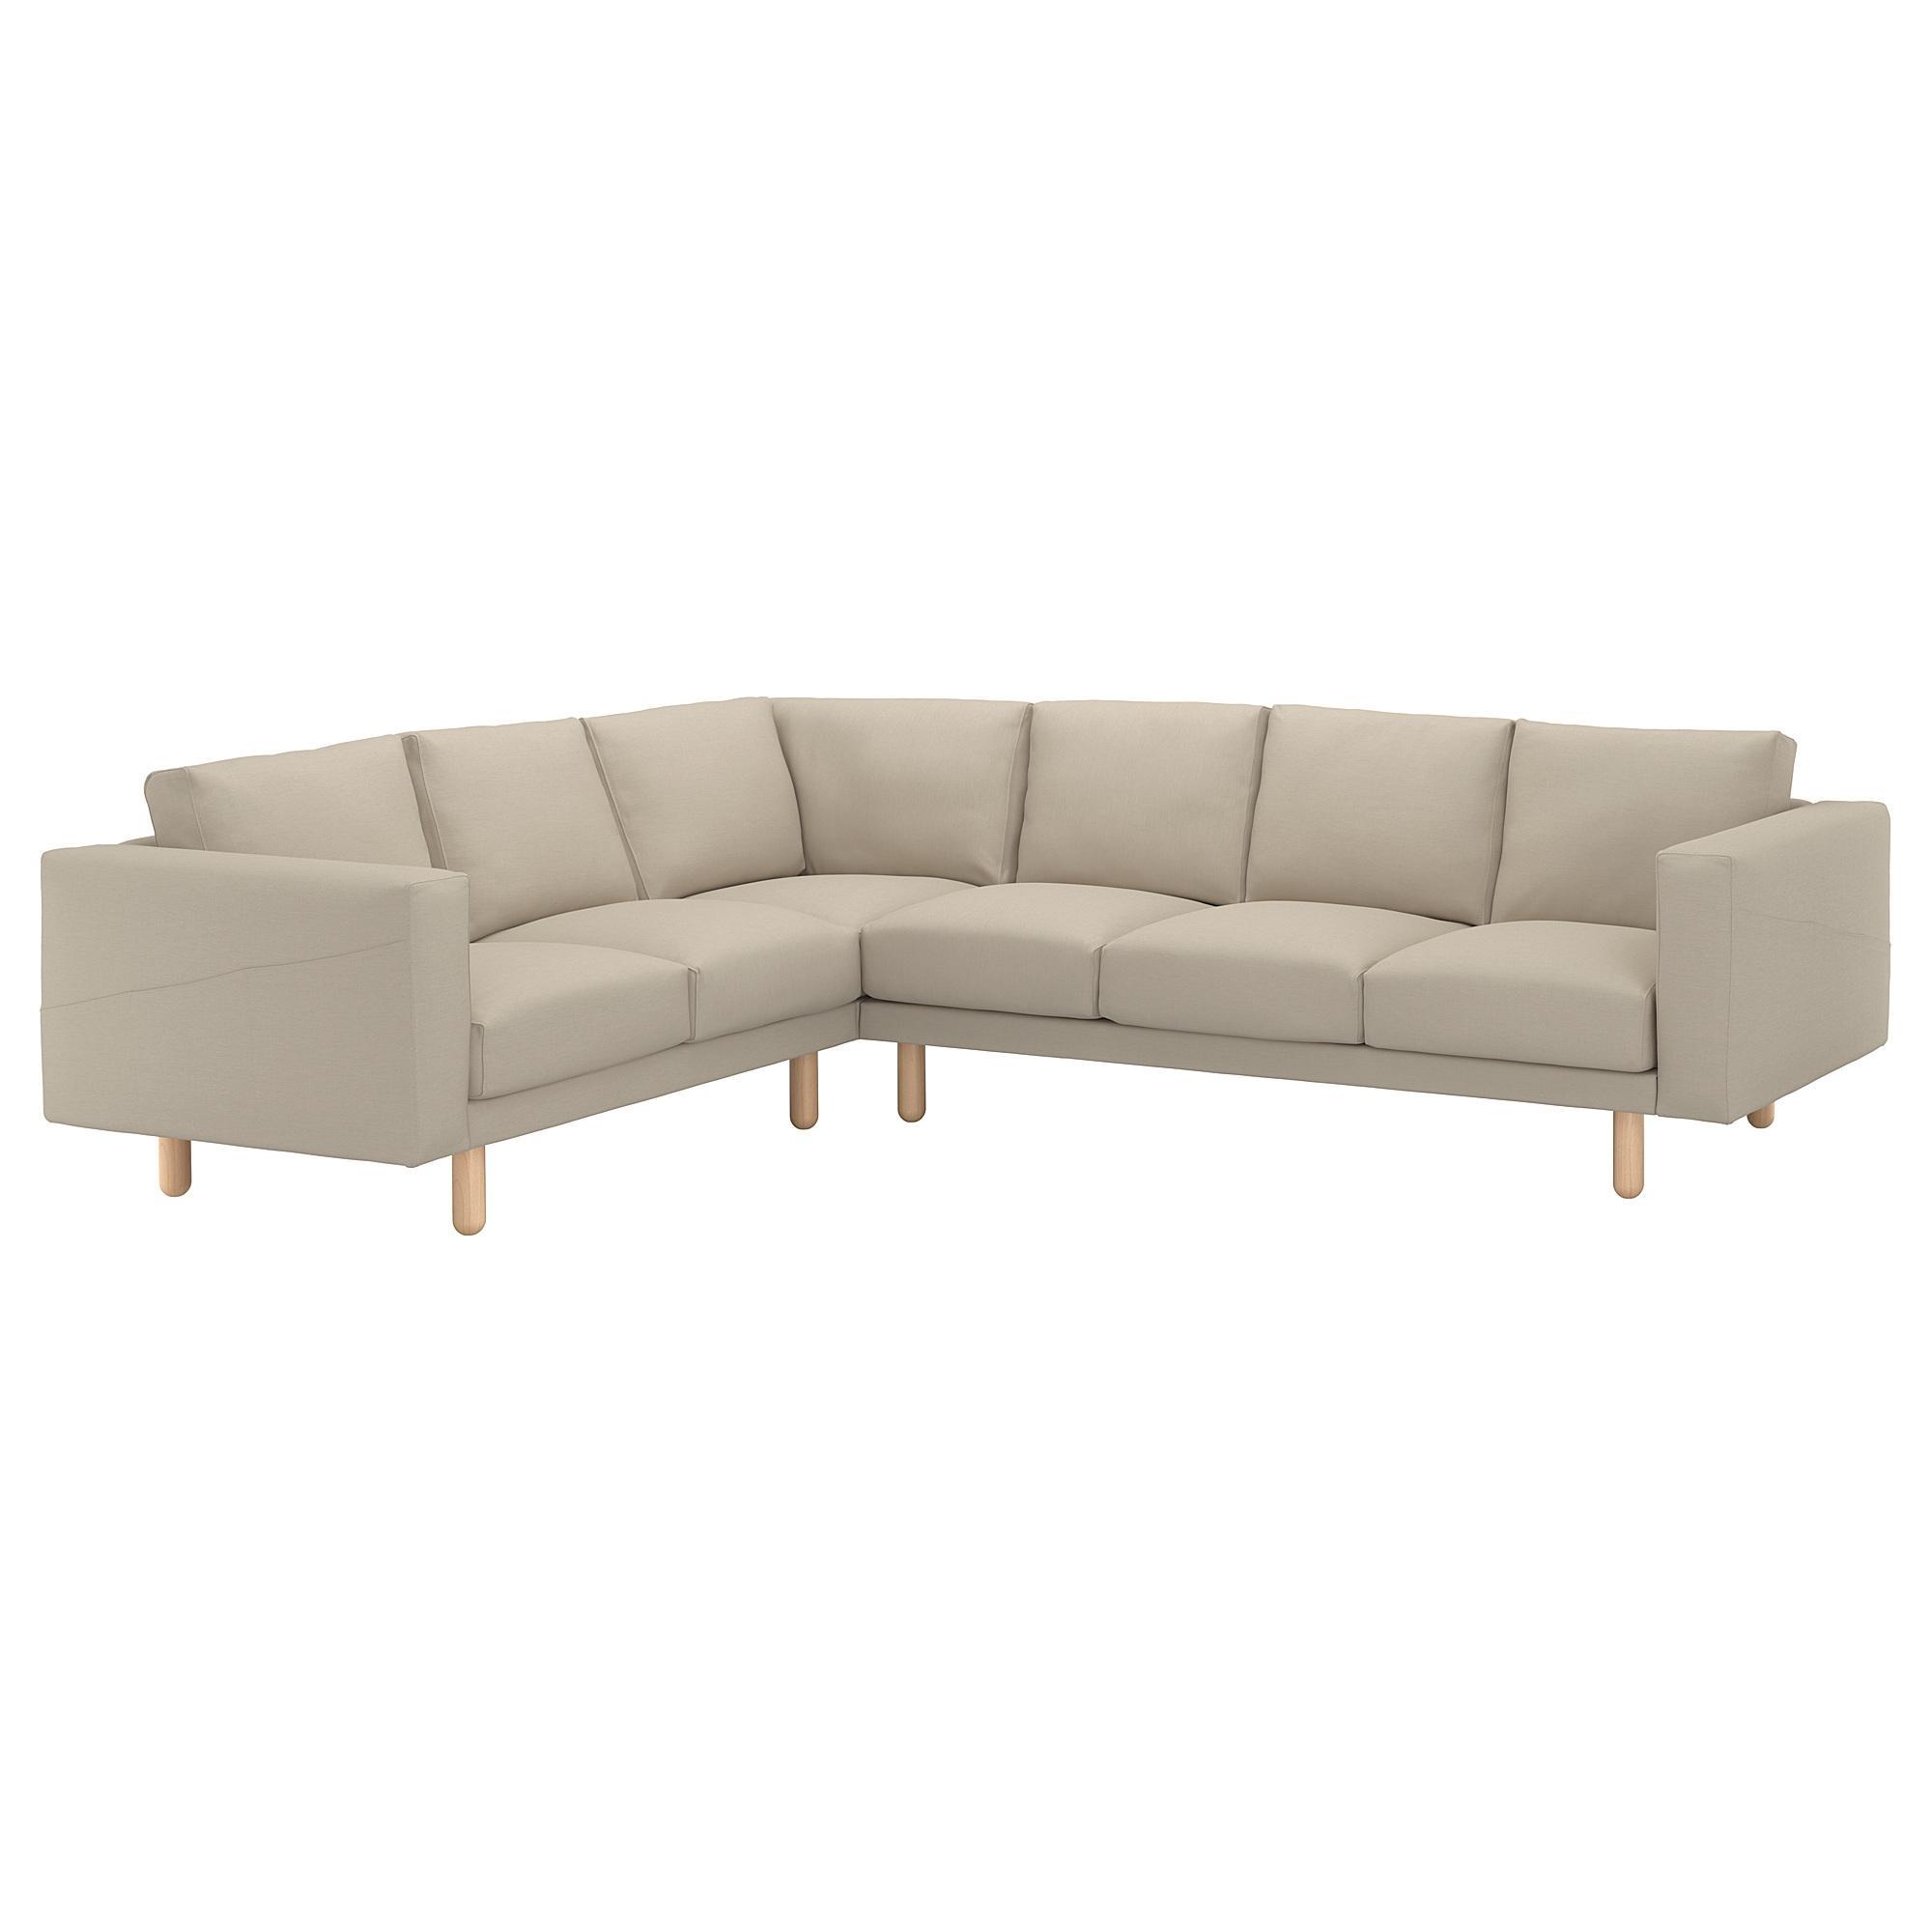 Fabric Sectional Sofas – Ikea Pertaining To Sofa Corner Units (Image 8 of 24)